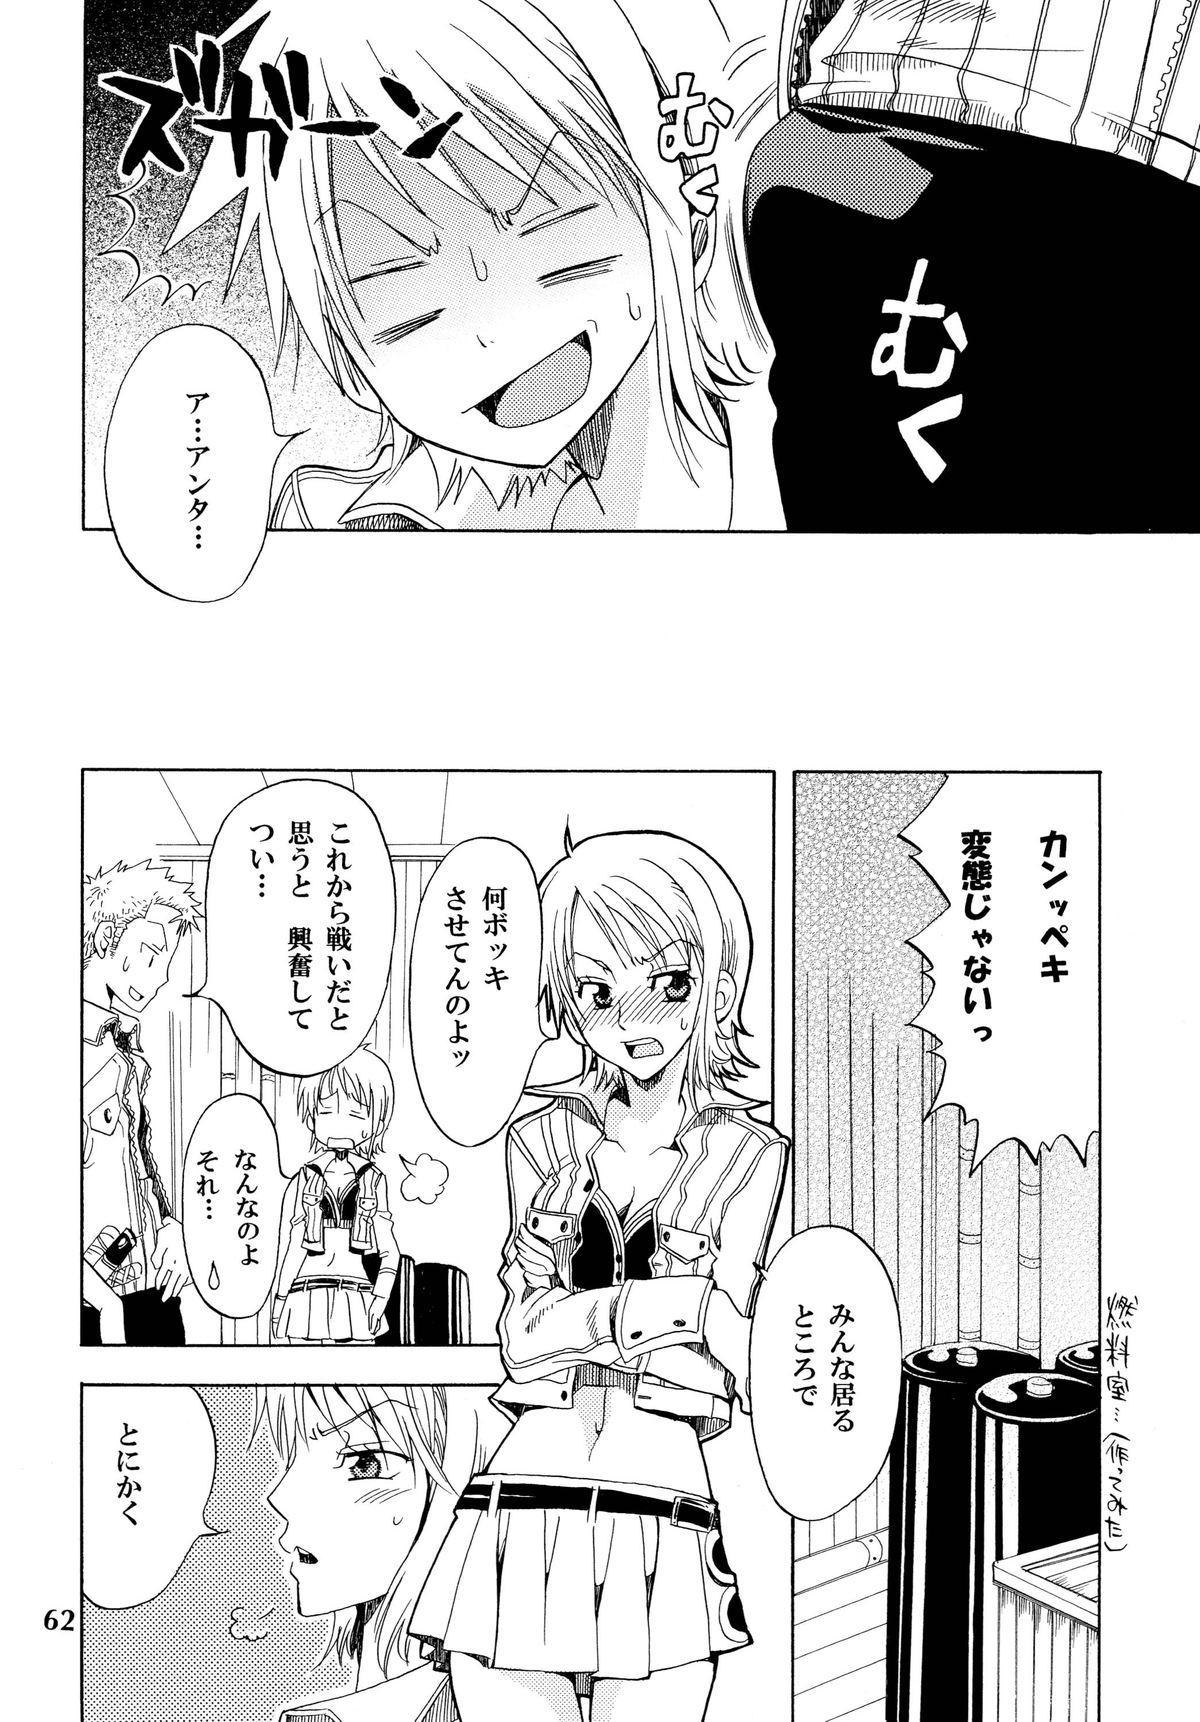 Zoro-Nami ★ Sairoku 61